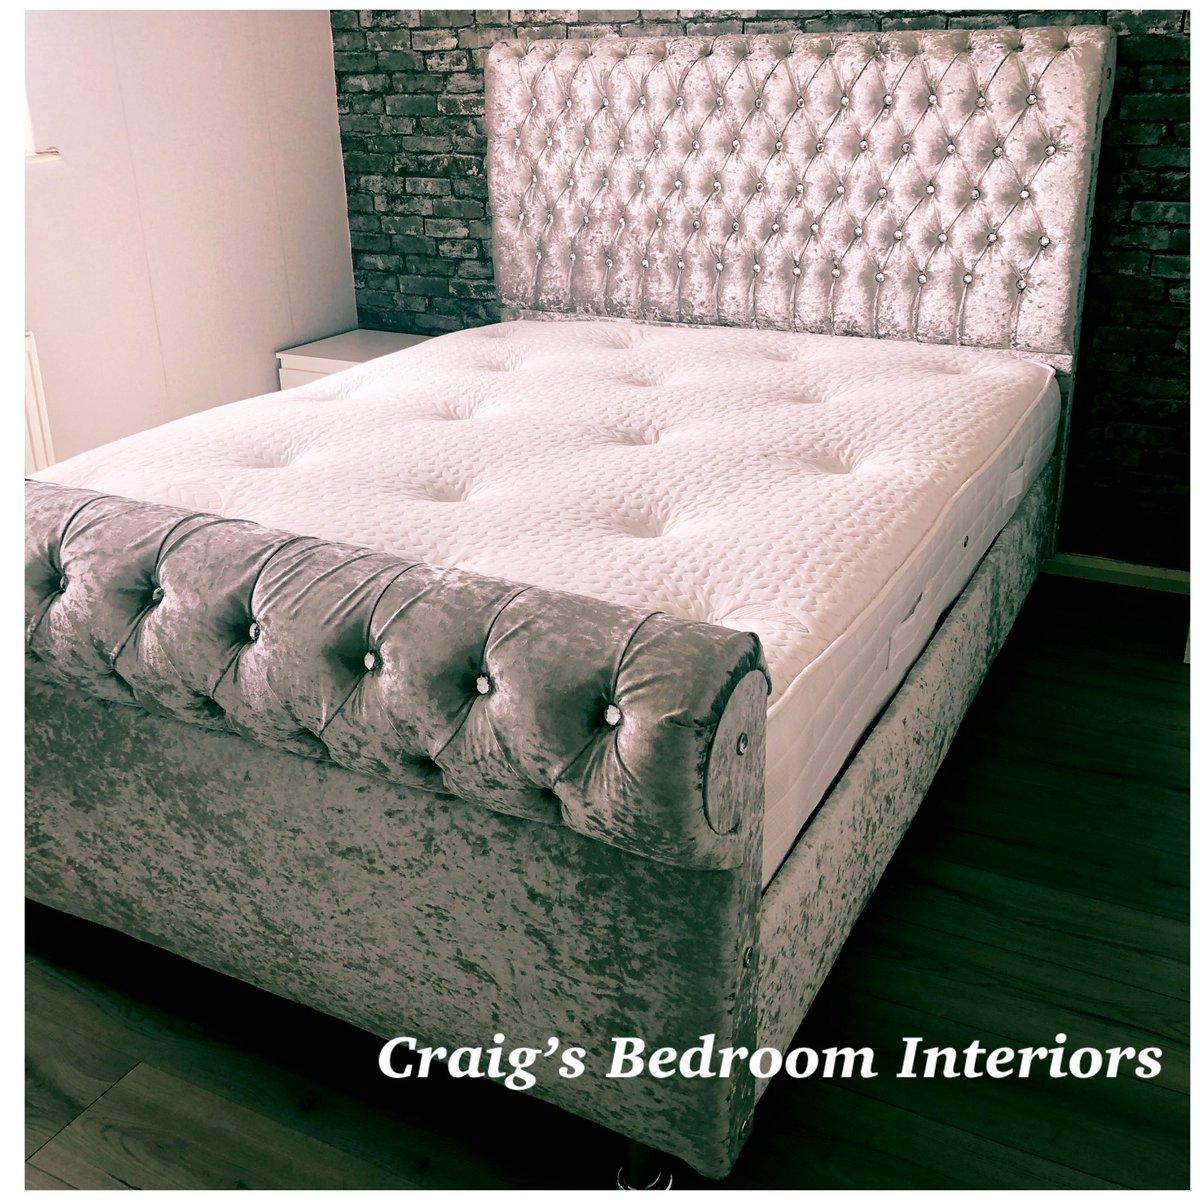 . Craig s Bedroom interiors   Craigs beds    Twitter